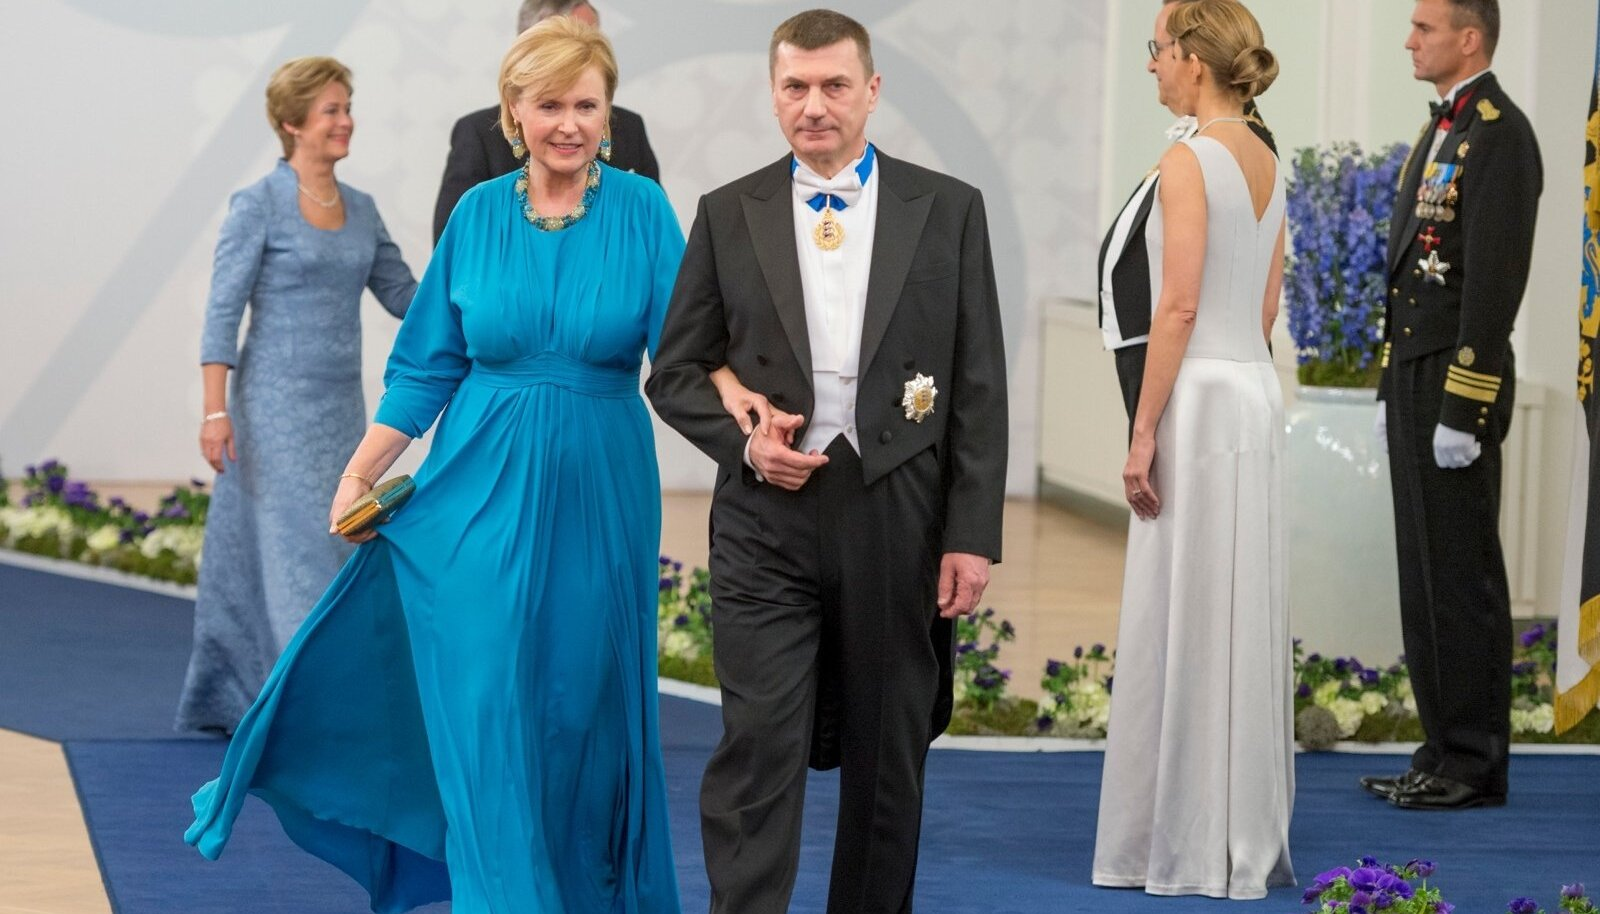 Endine peaminister, Euroopa Komisjoni asepresident Andrus Ansip ja pr Anu Ansip